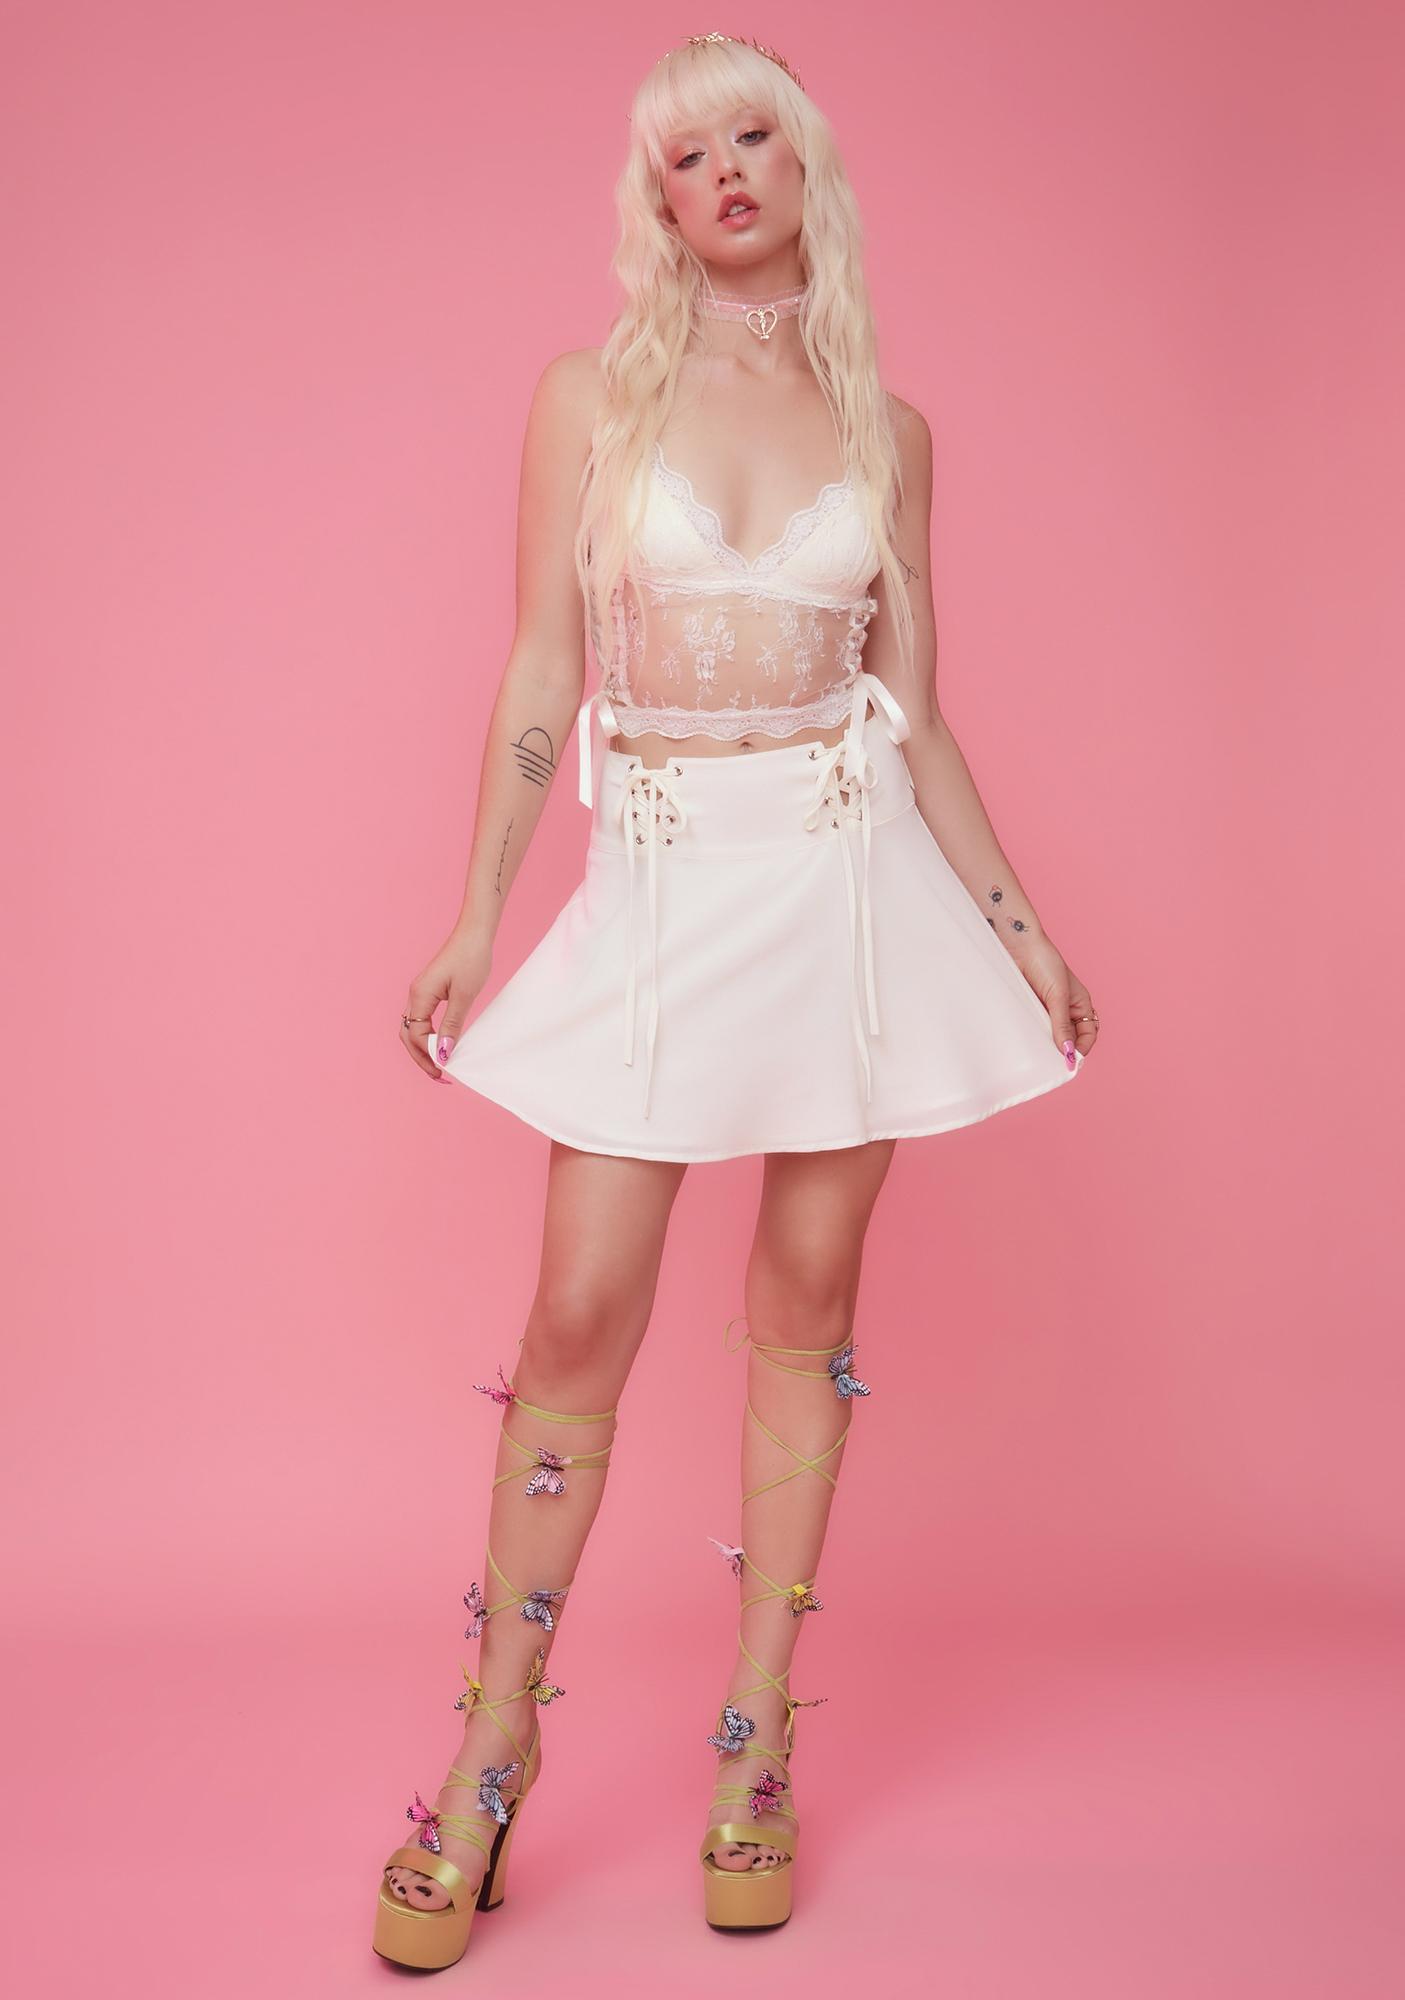 Sugar Thrillz First Woman Sheer Lace Crop Top